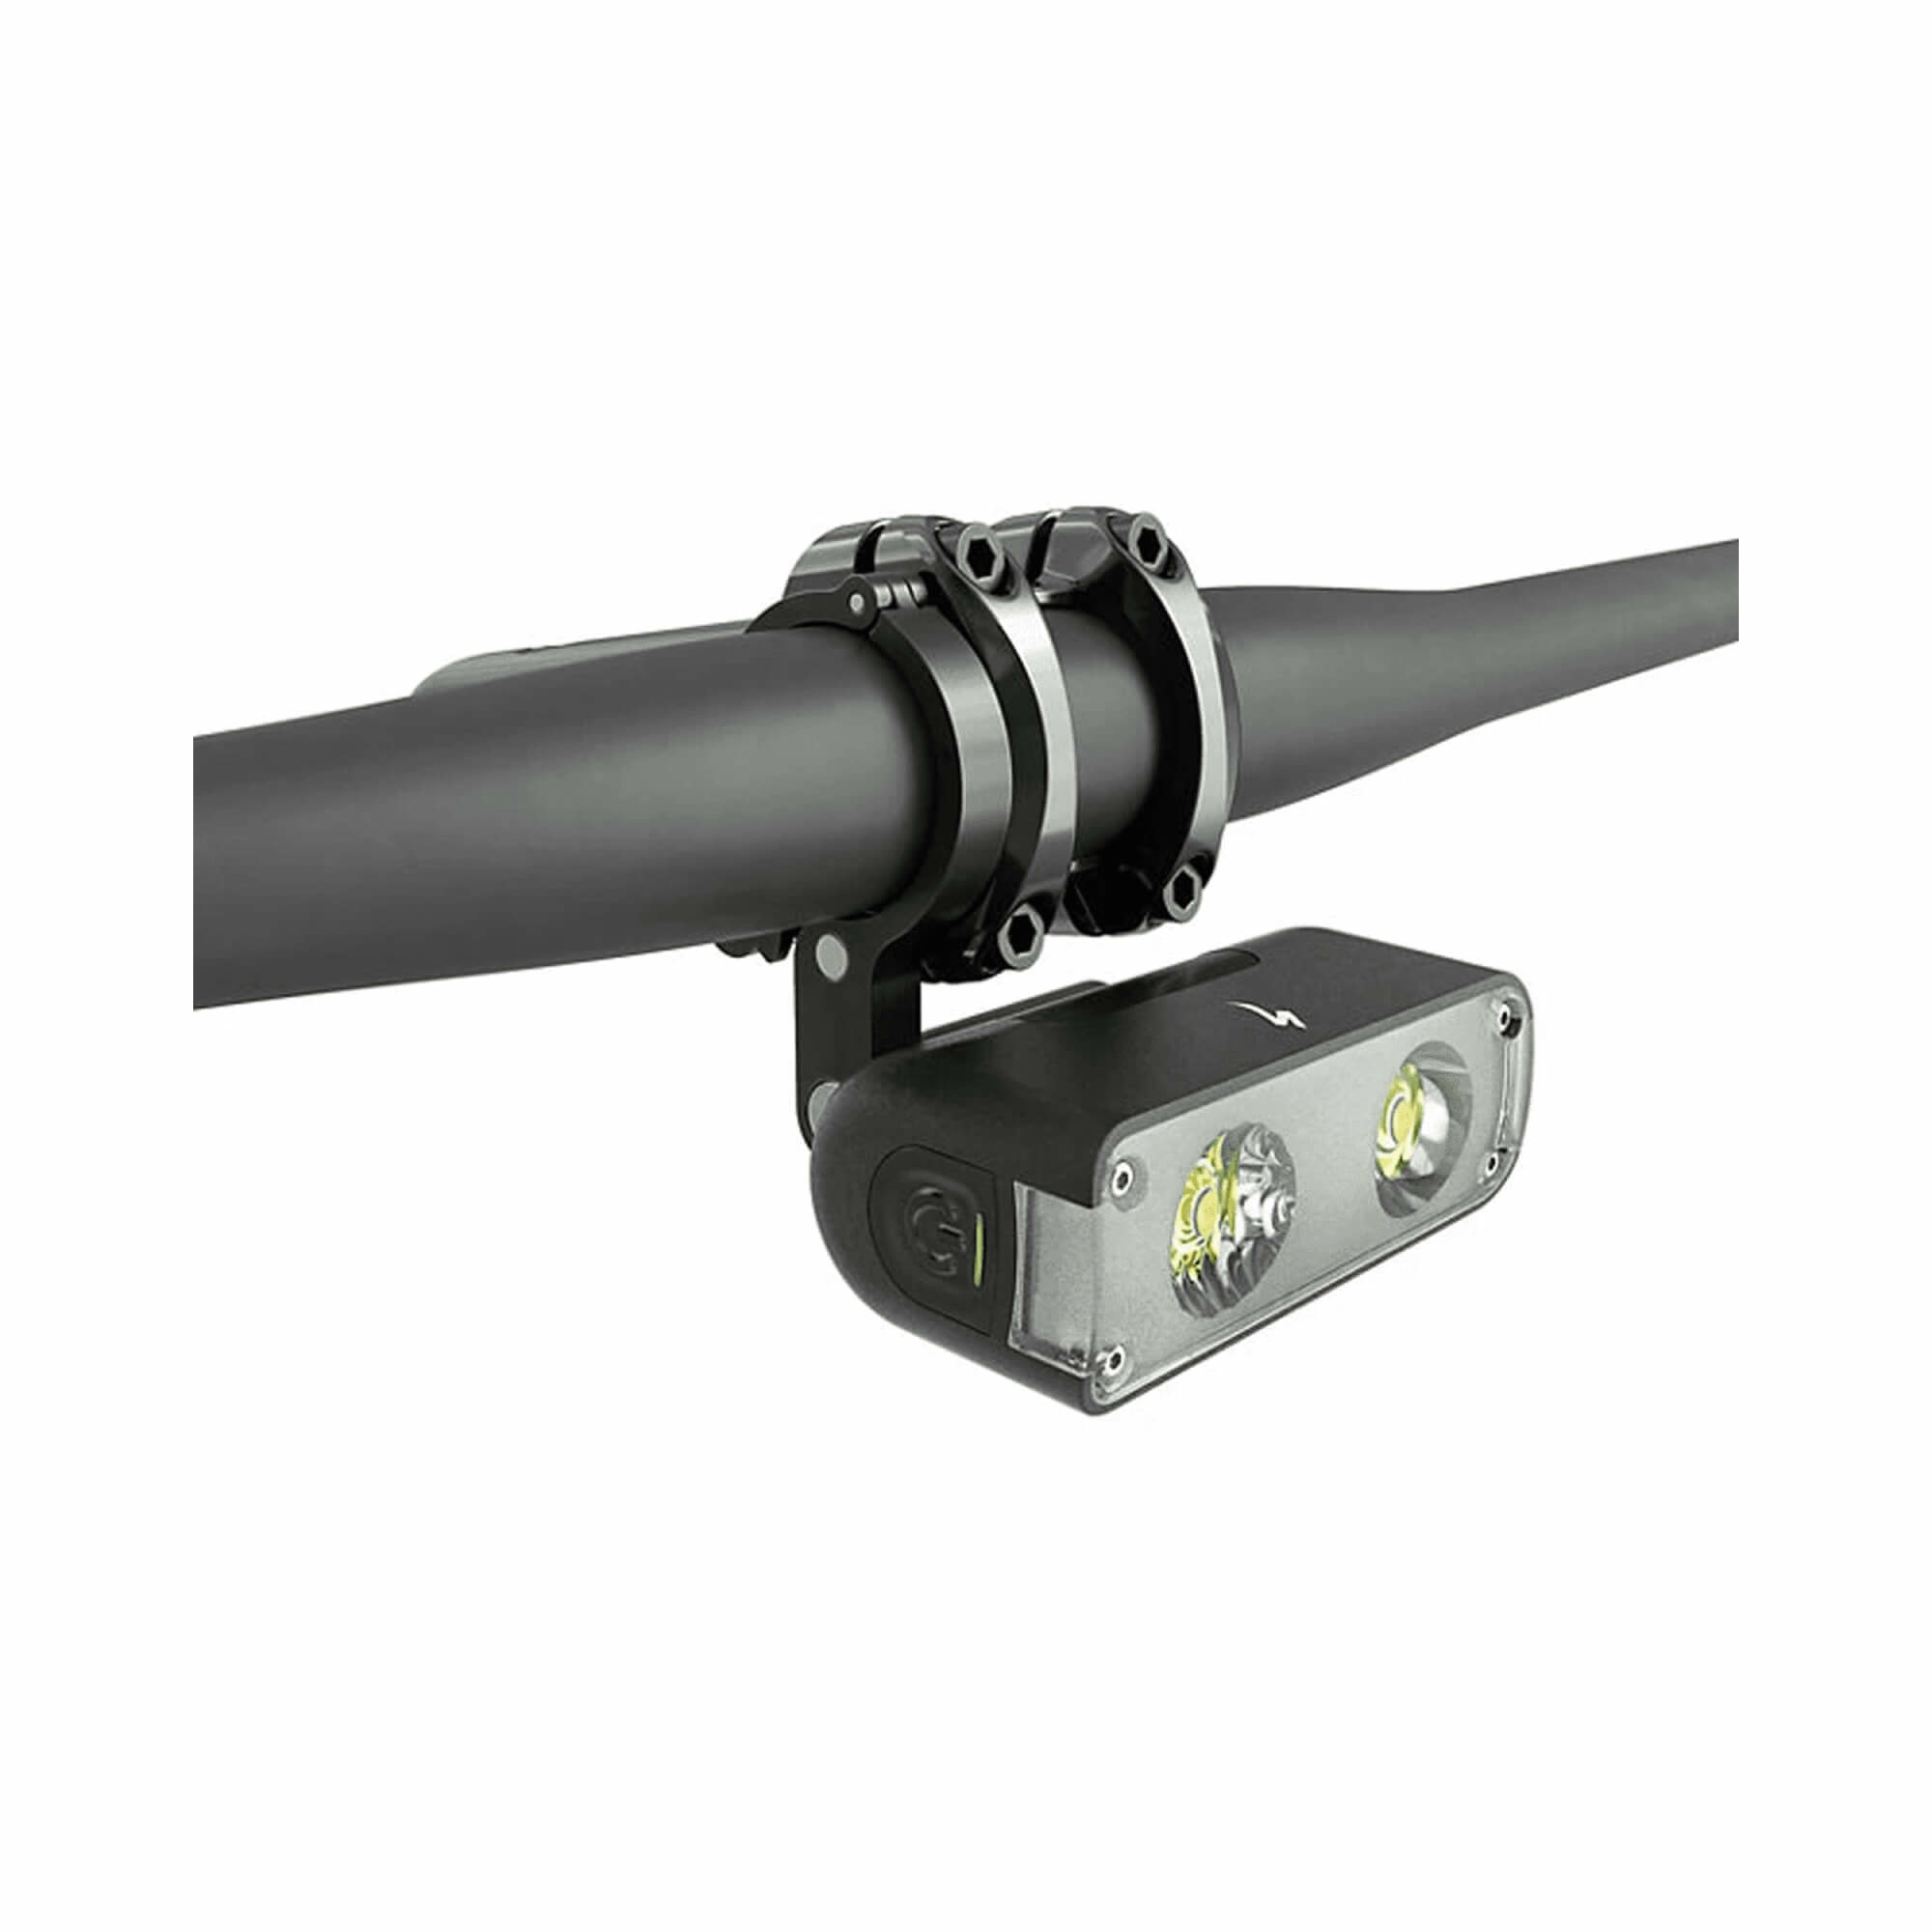 Flux 850 Headlight-1